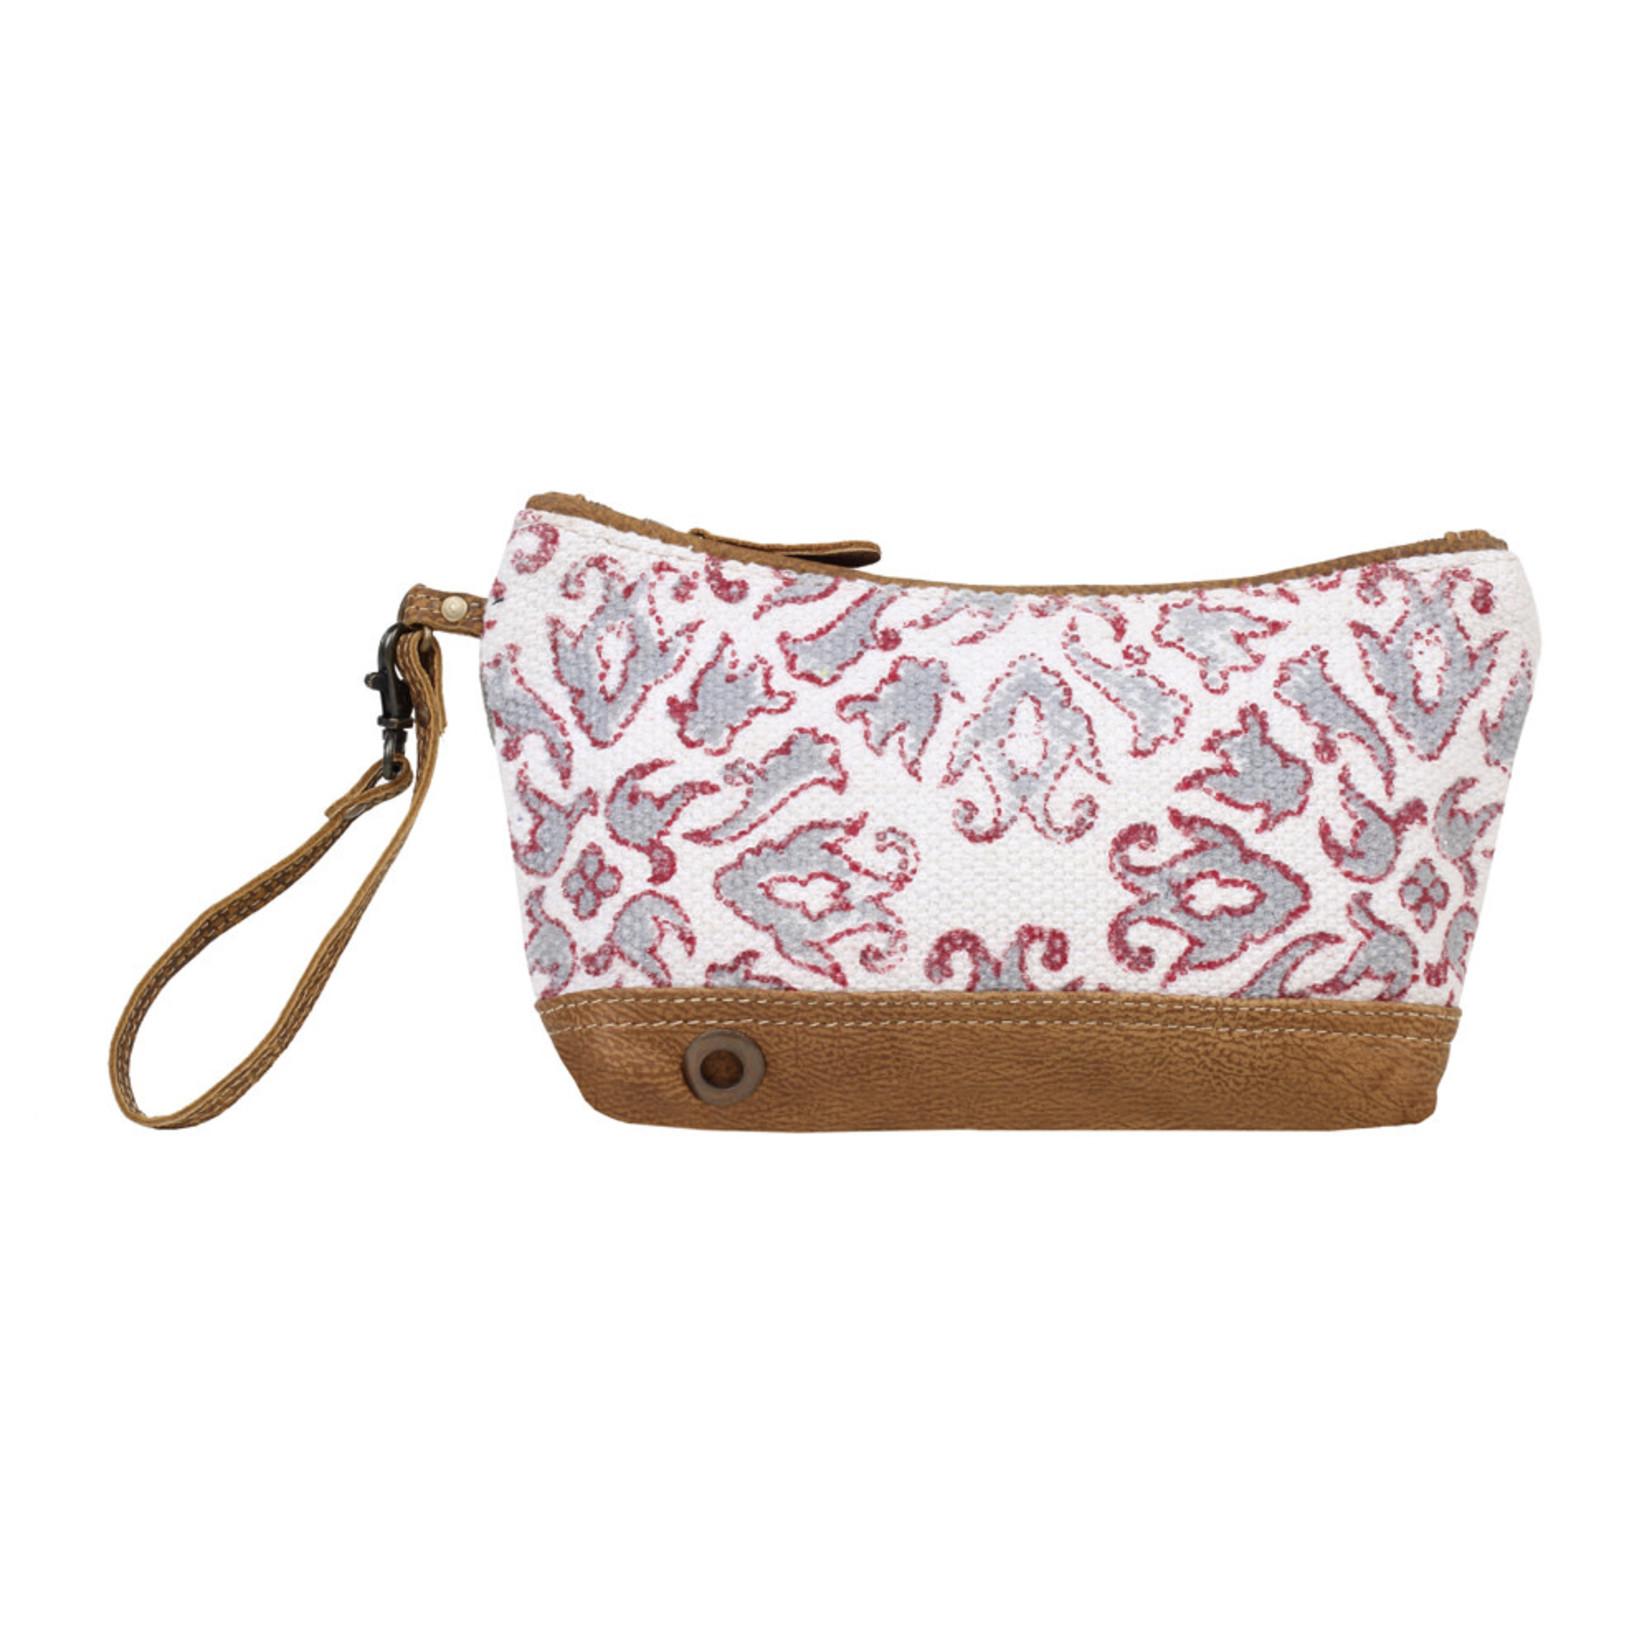 Myra Bags S-2635 Appreciation Wristlet / Pouch